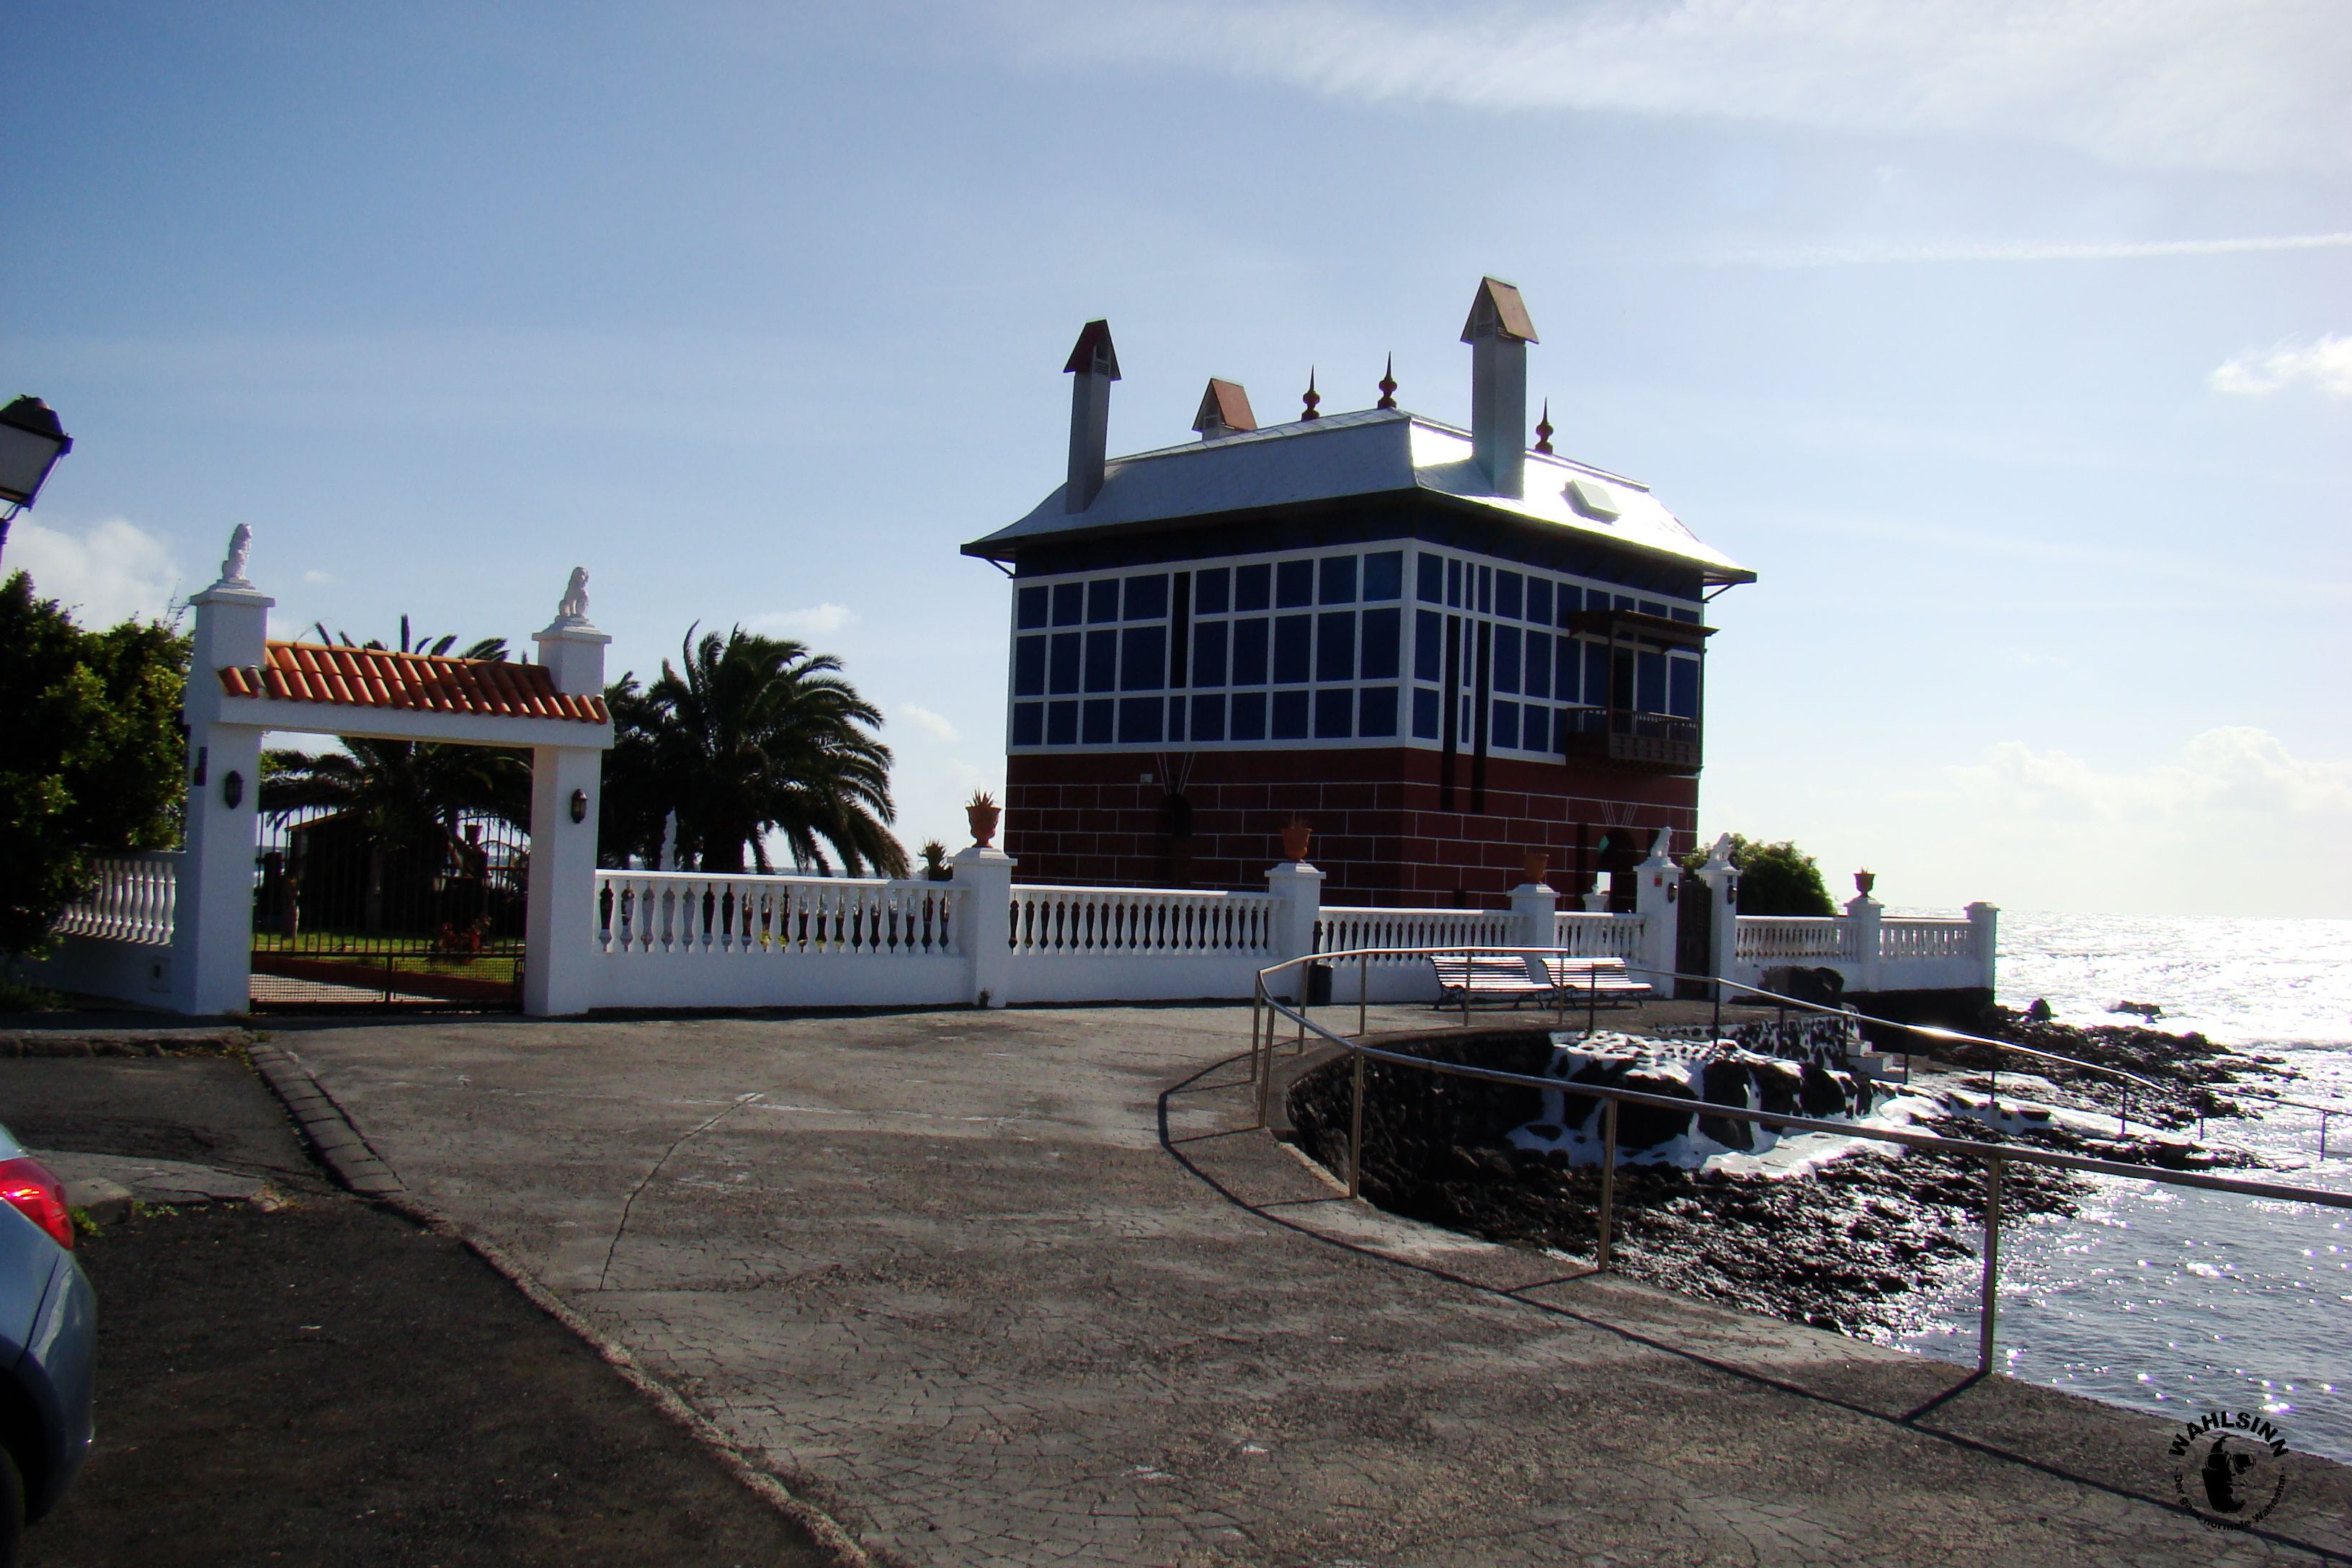 Lanzarote - Das Blaue Haus in Arrieta